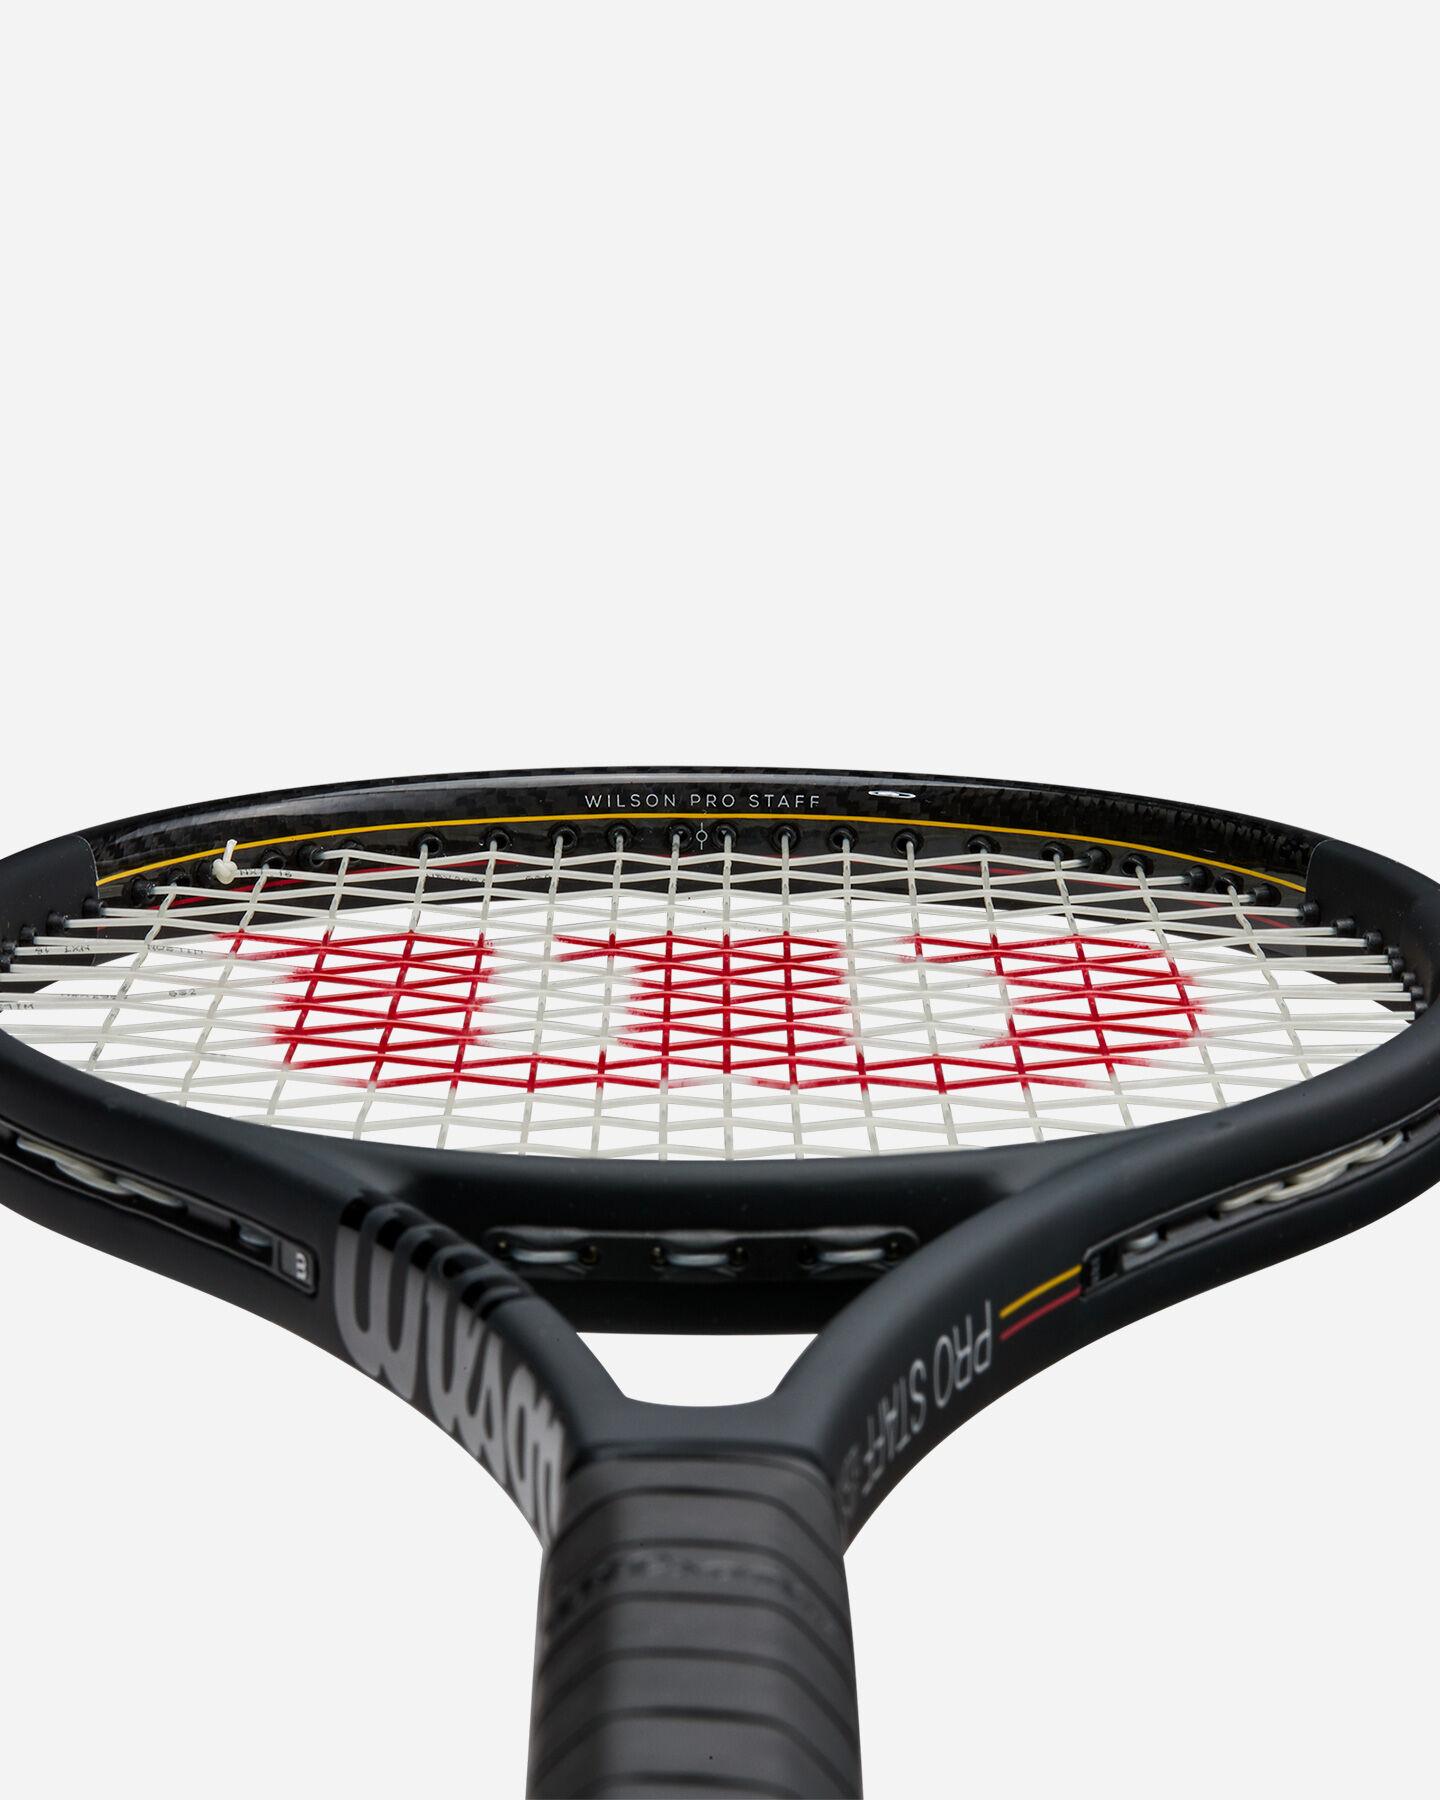 Telaio tennis WILSON PRO STAFF 97 V13.0  S5282626 scatto 3